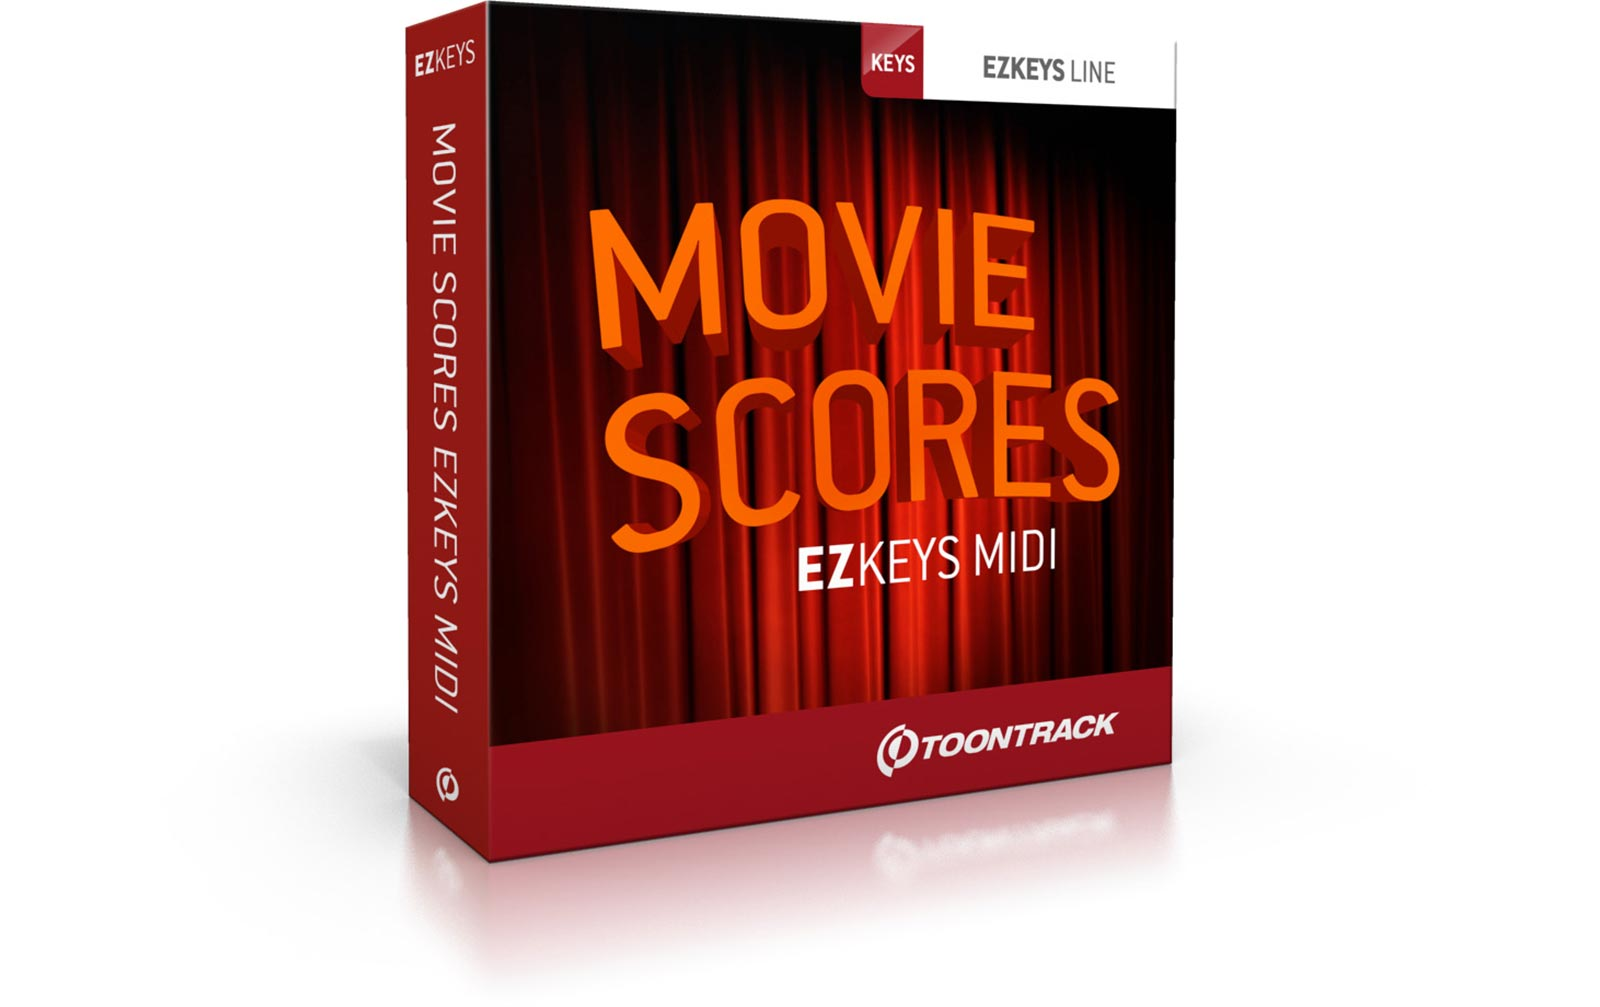 toontrack-ezkeys-movie-scores-midi-pack-download-